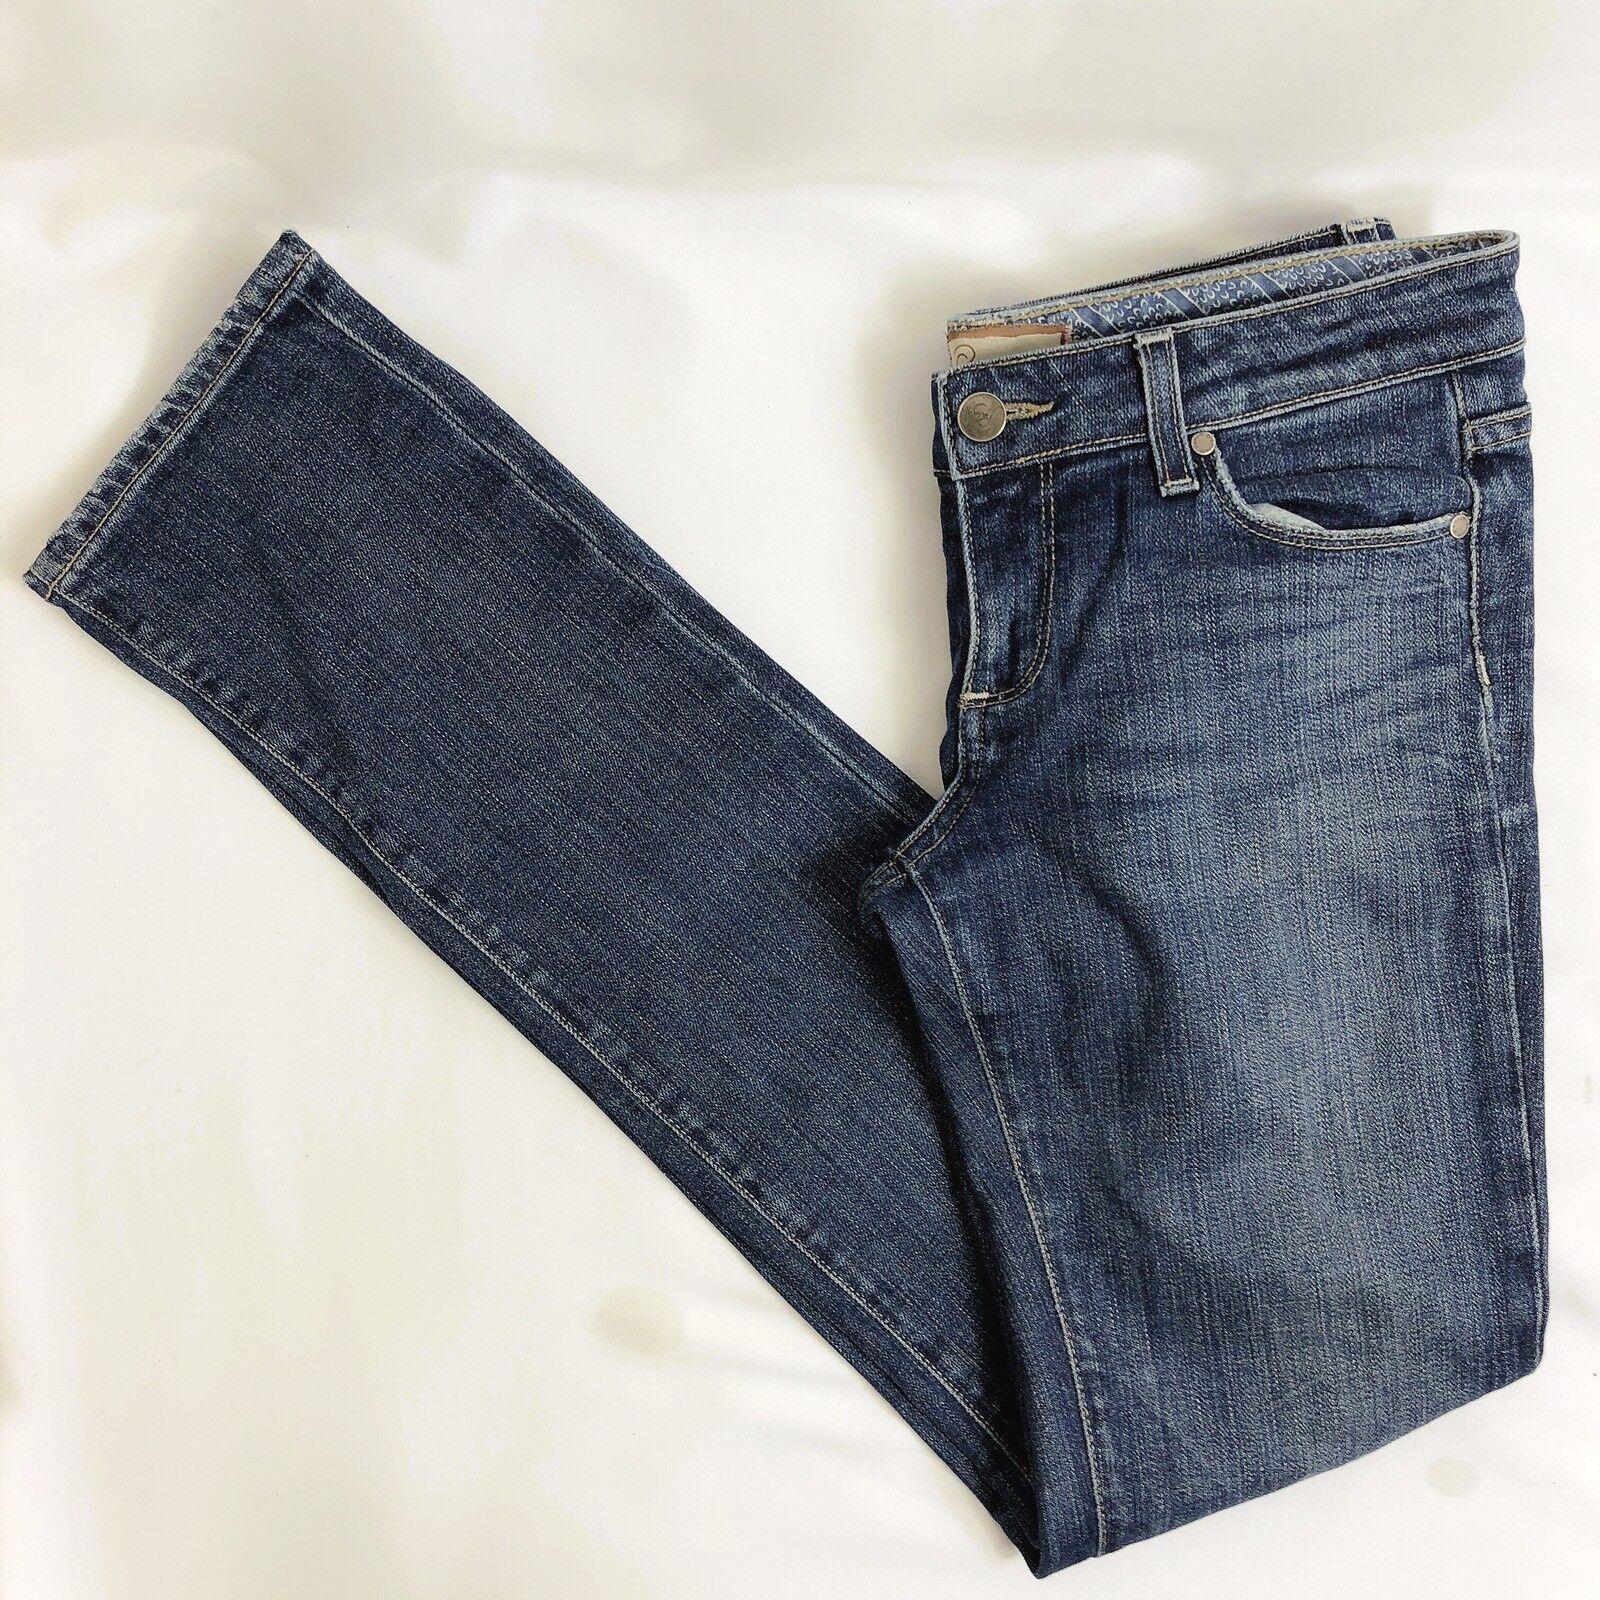 Paige Premium Denim Women 27 bluee Straight Skinny Leg Jeans Pants FITS 28